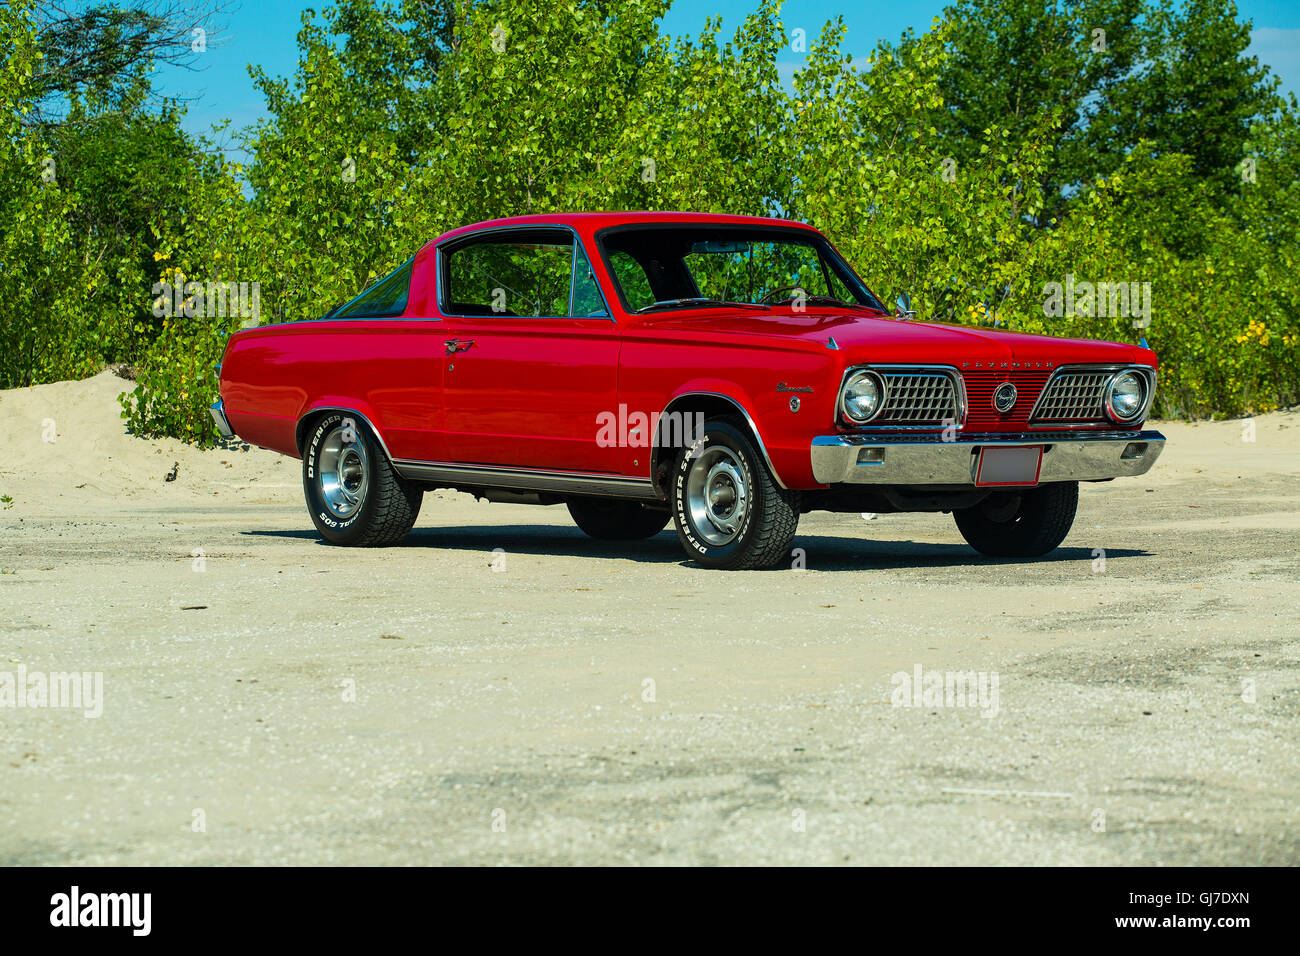 1966 Plymouth Barracuda Formula S - Stock Image